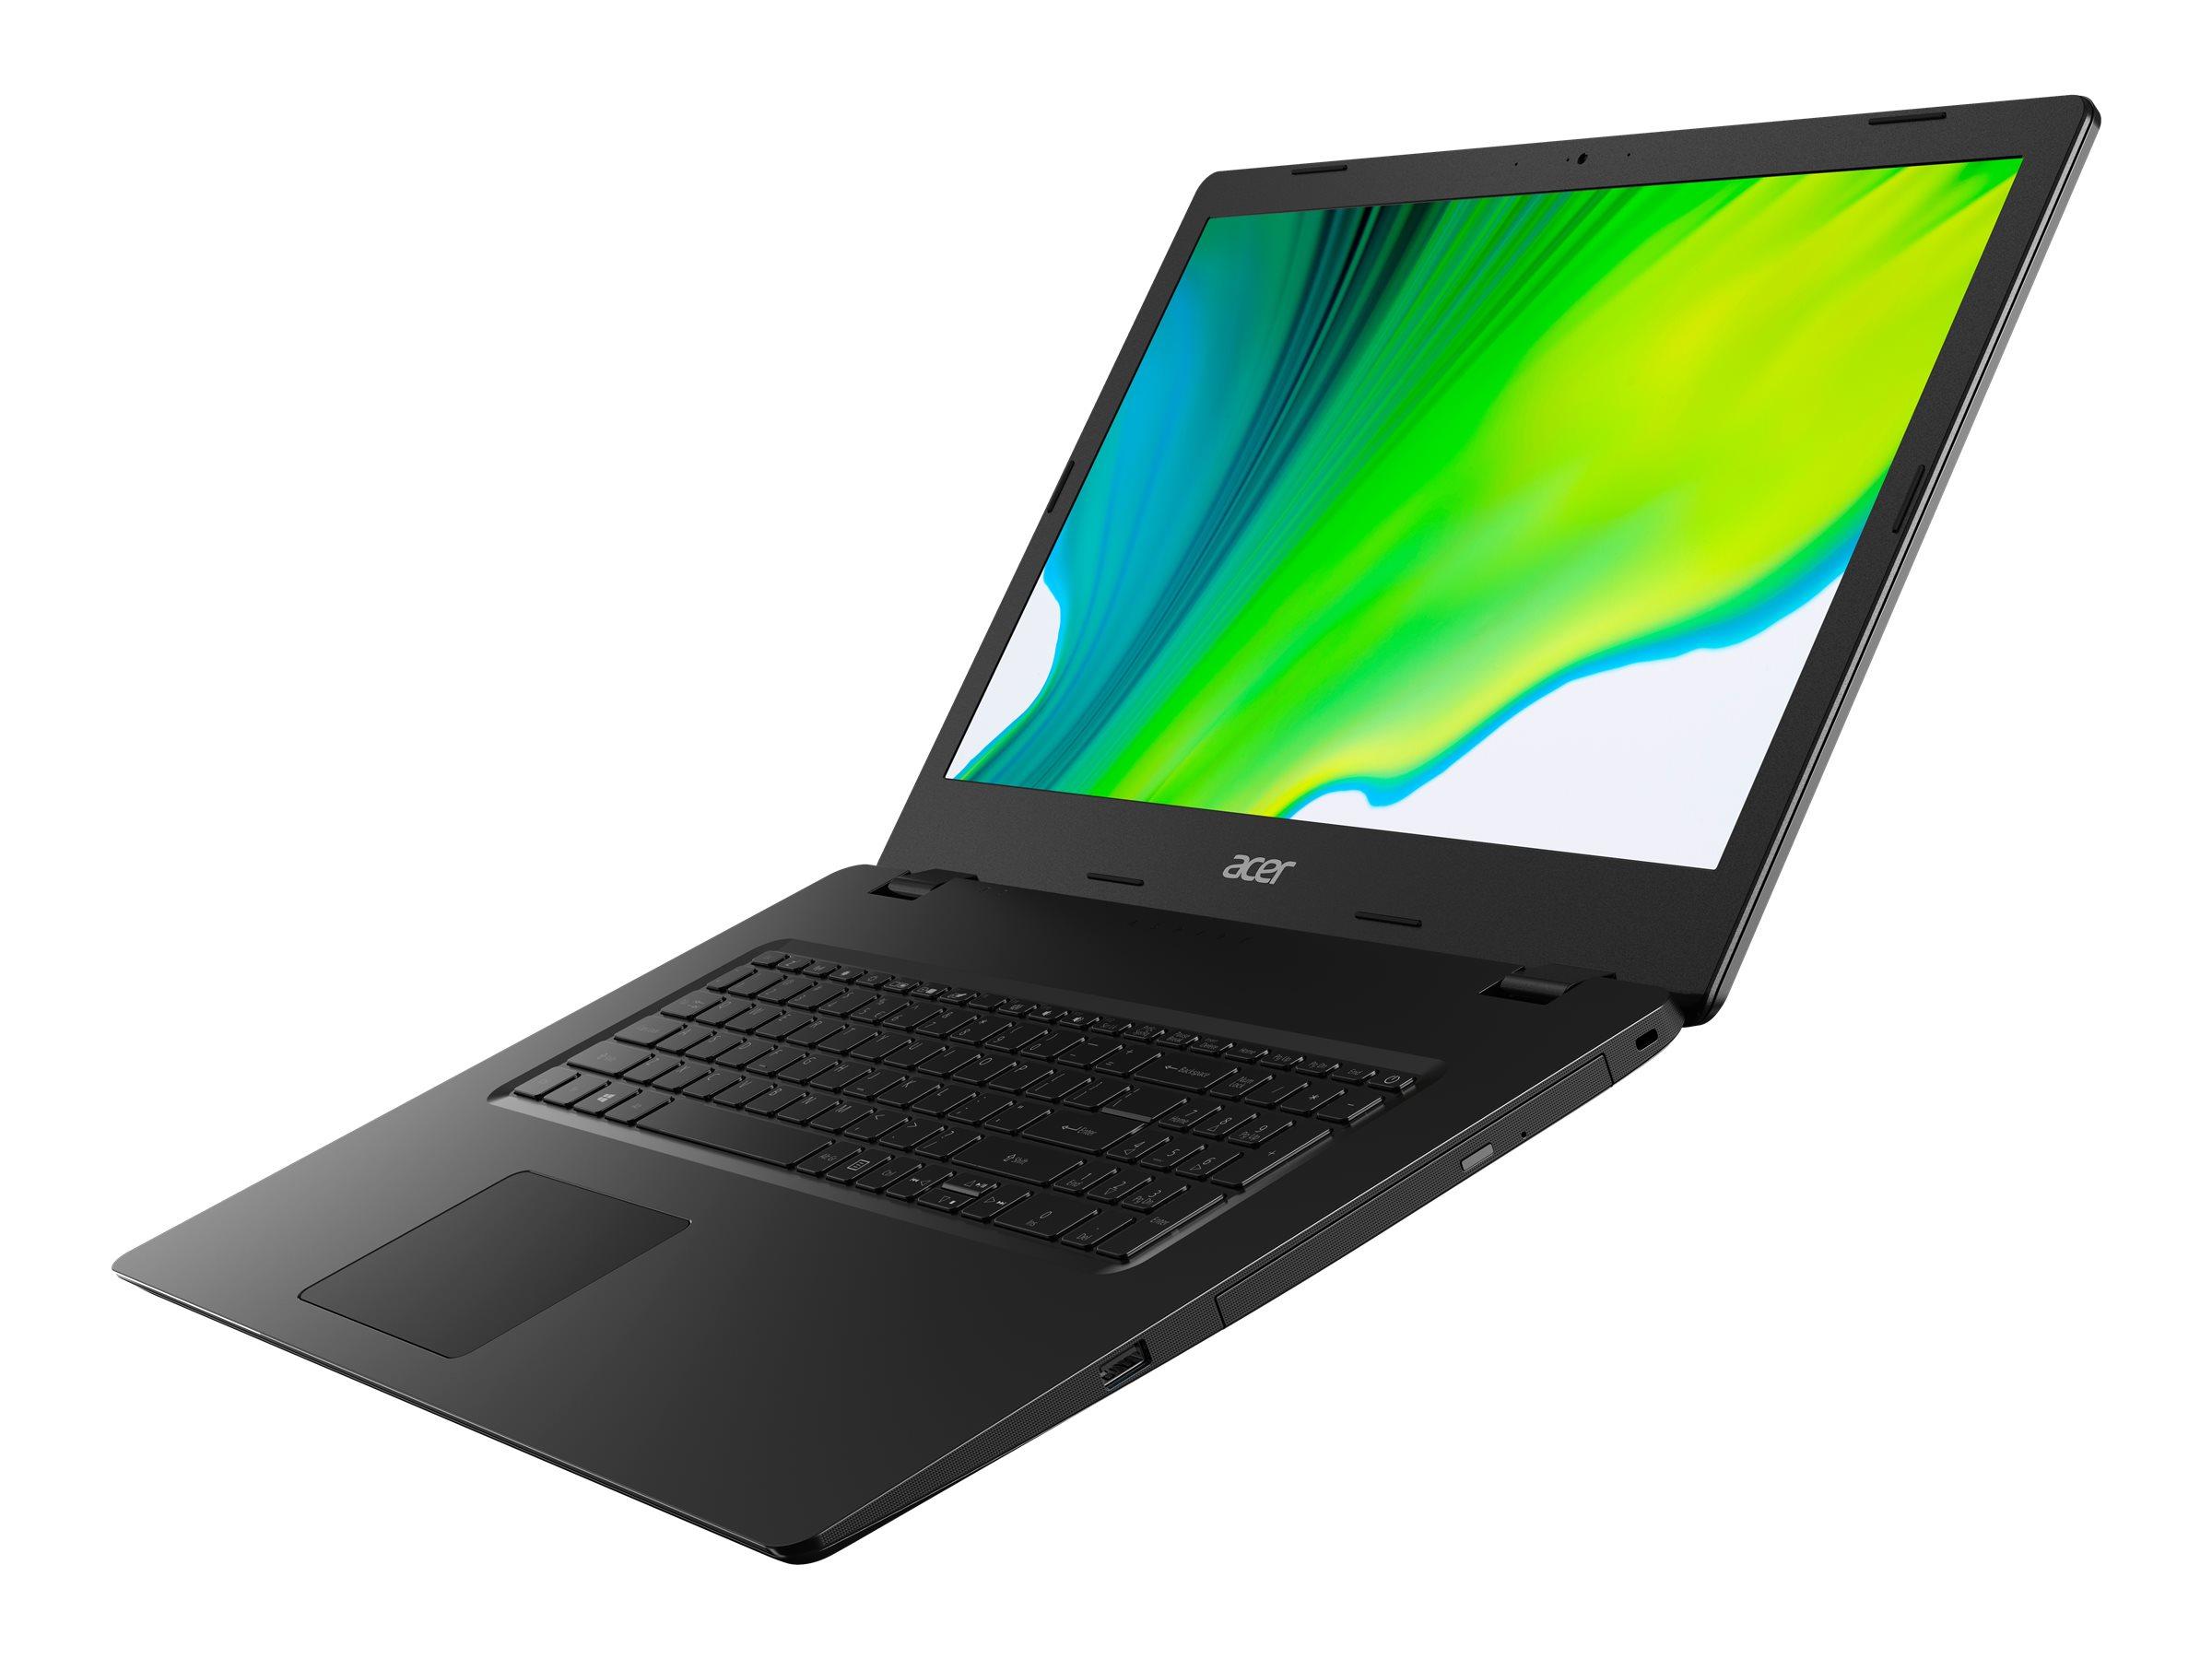 "Acer Aspire 3 A317-52-3273 - Core i3 1005G1 / 1.2 GHz - Win 10 Pro 64-Bit - 8 GB RAM - 256 GB SSD NVMe - DVD-Writer - 43.94 cm (17.3"")"